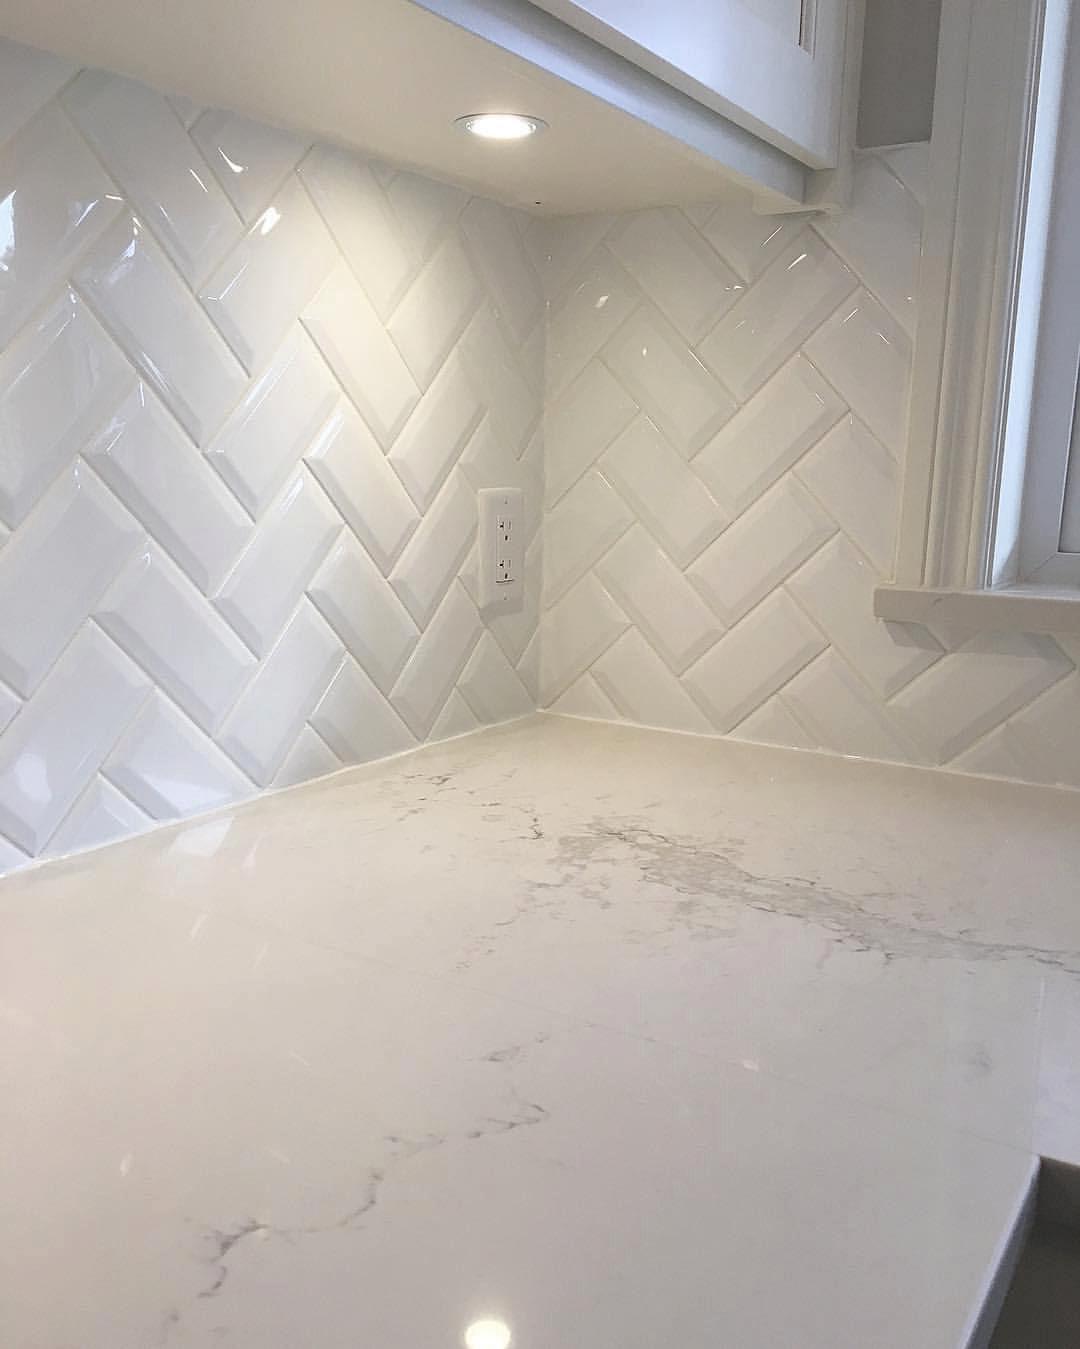 71 Dazzling White Subway Tiles Inspirations | Pinterest